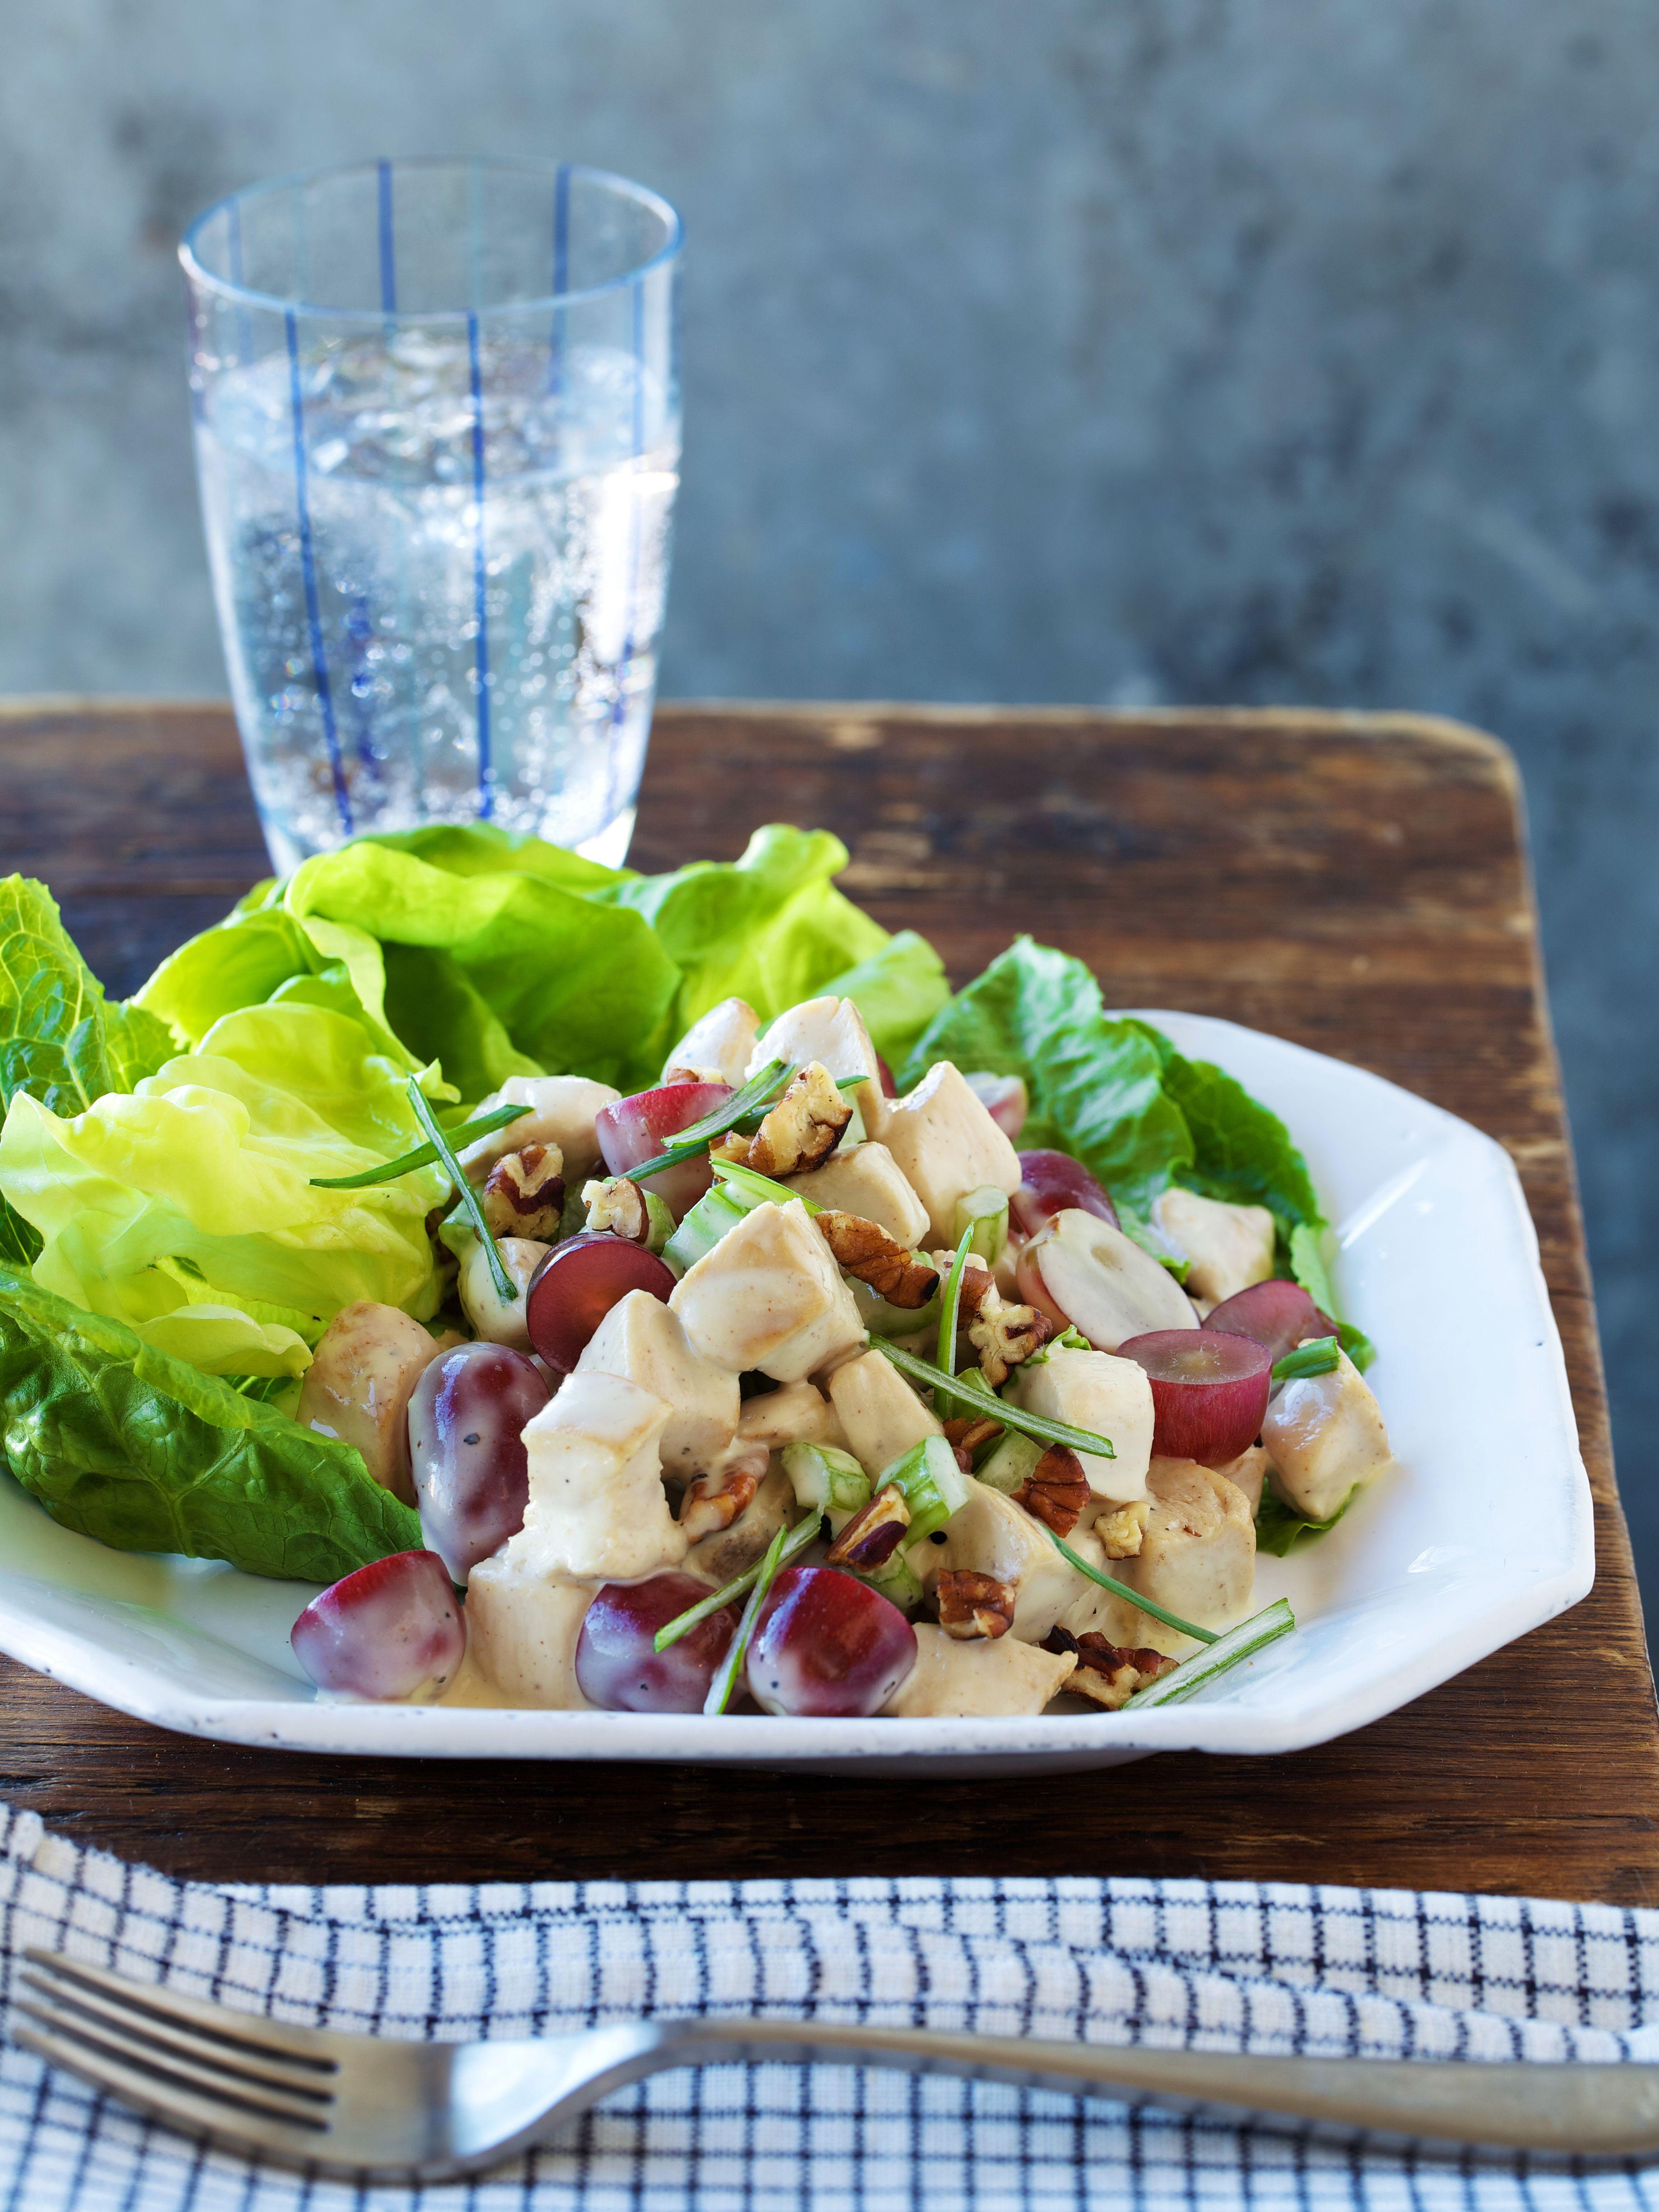 Chicken salad recipe salad recipes and easy chicken salad recipe chicken salad forumfinder Gallery